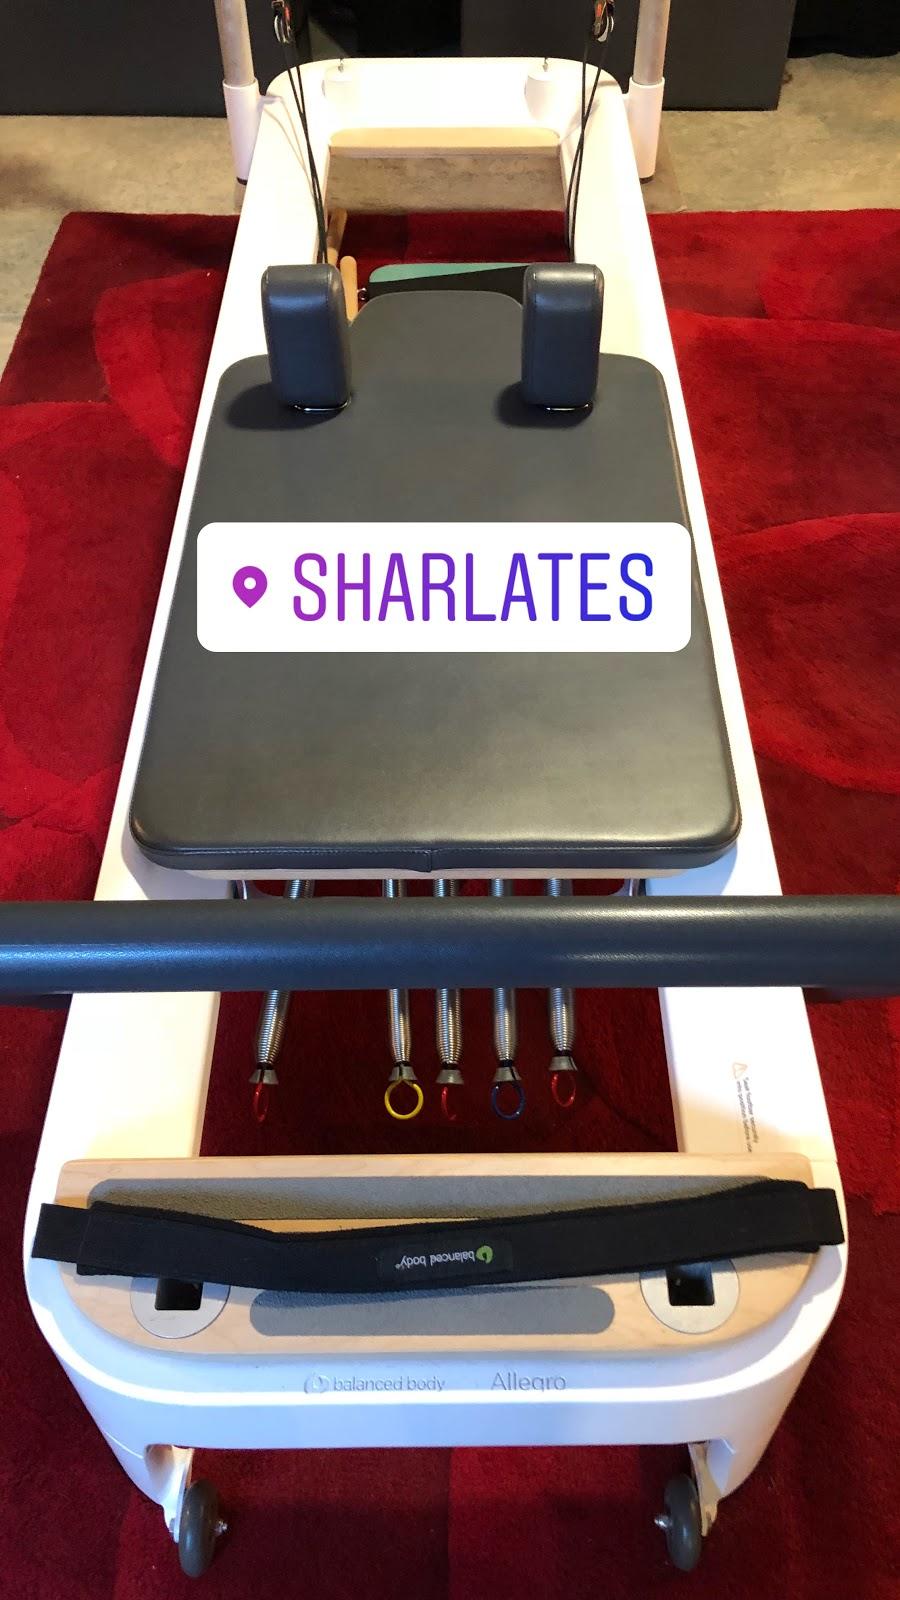 Sharlates - gym  | Photo 6 of 6 | Address: 7936 Morning Dew Rd, Colorado Springs, CO 80908, USA | Phone: (614) 580-0780